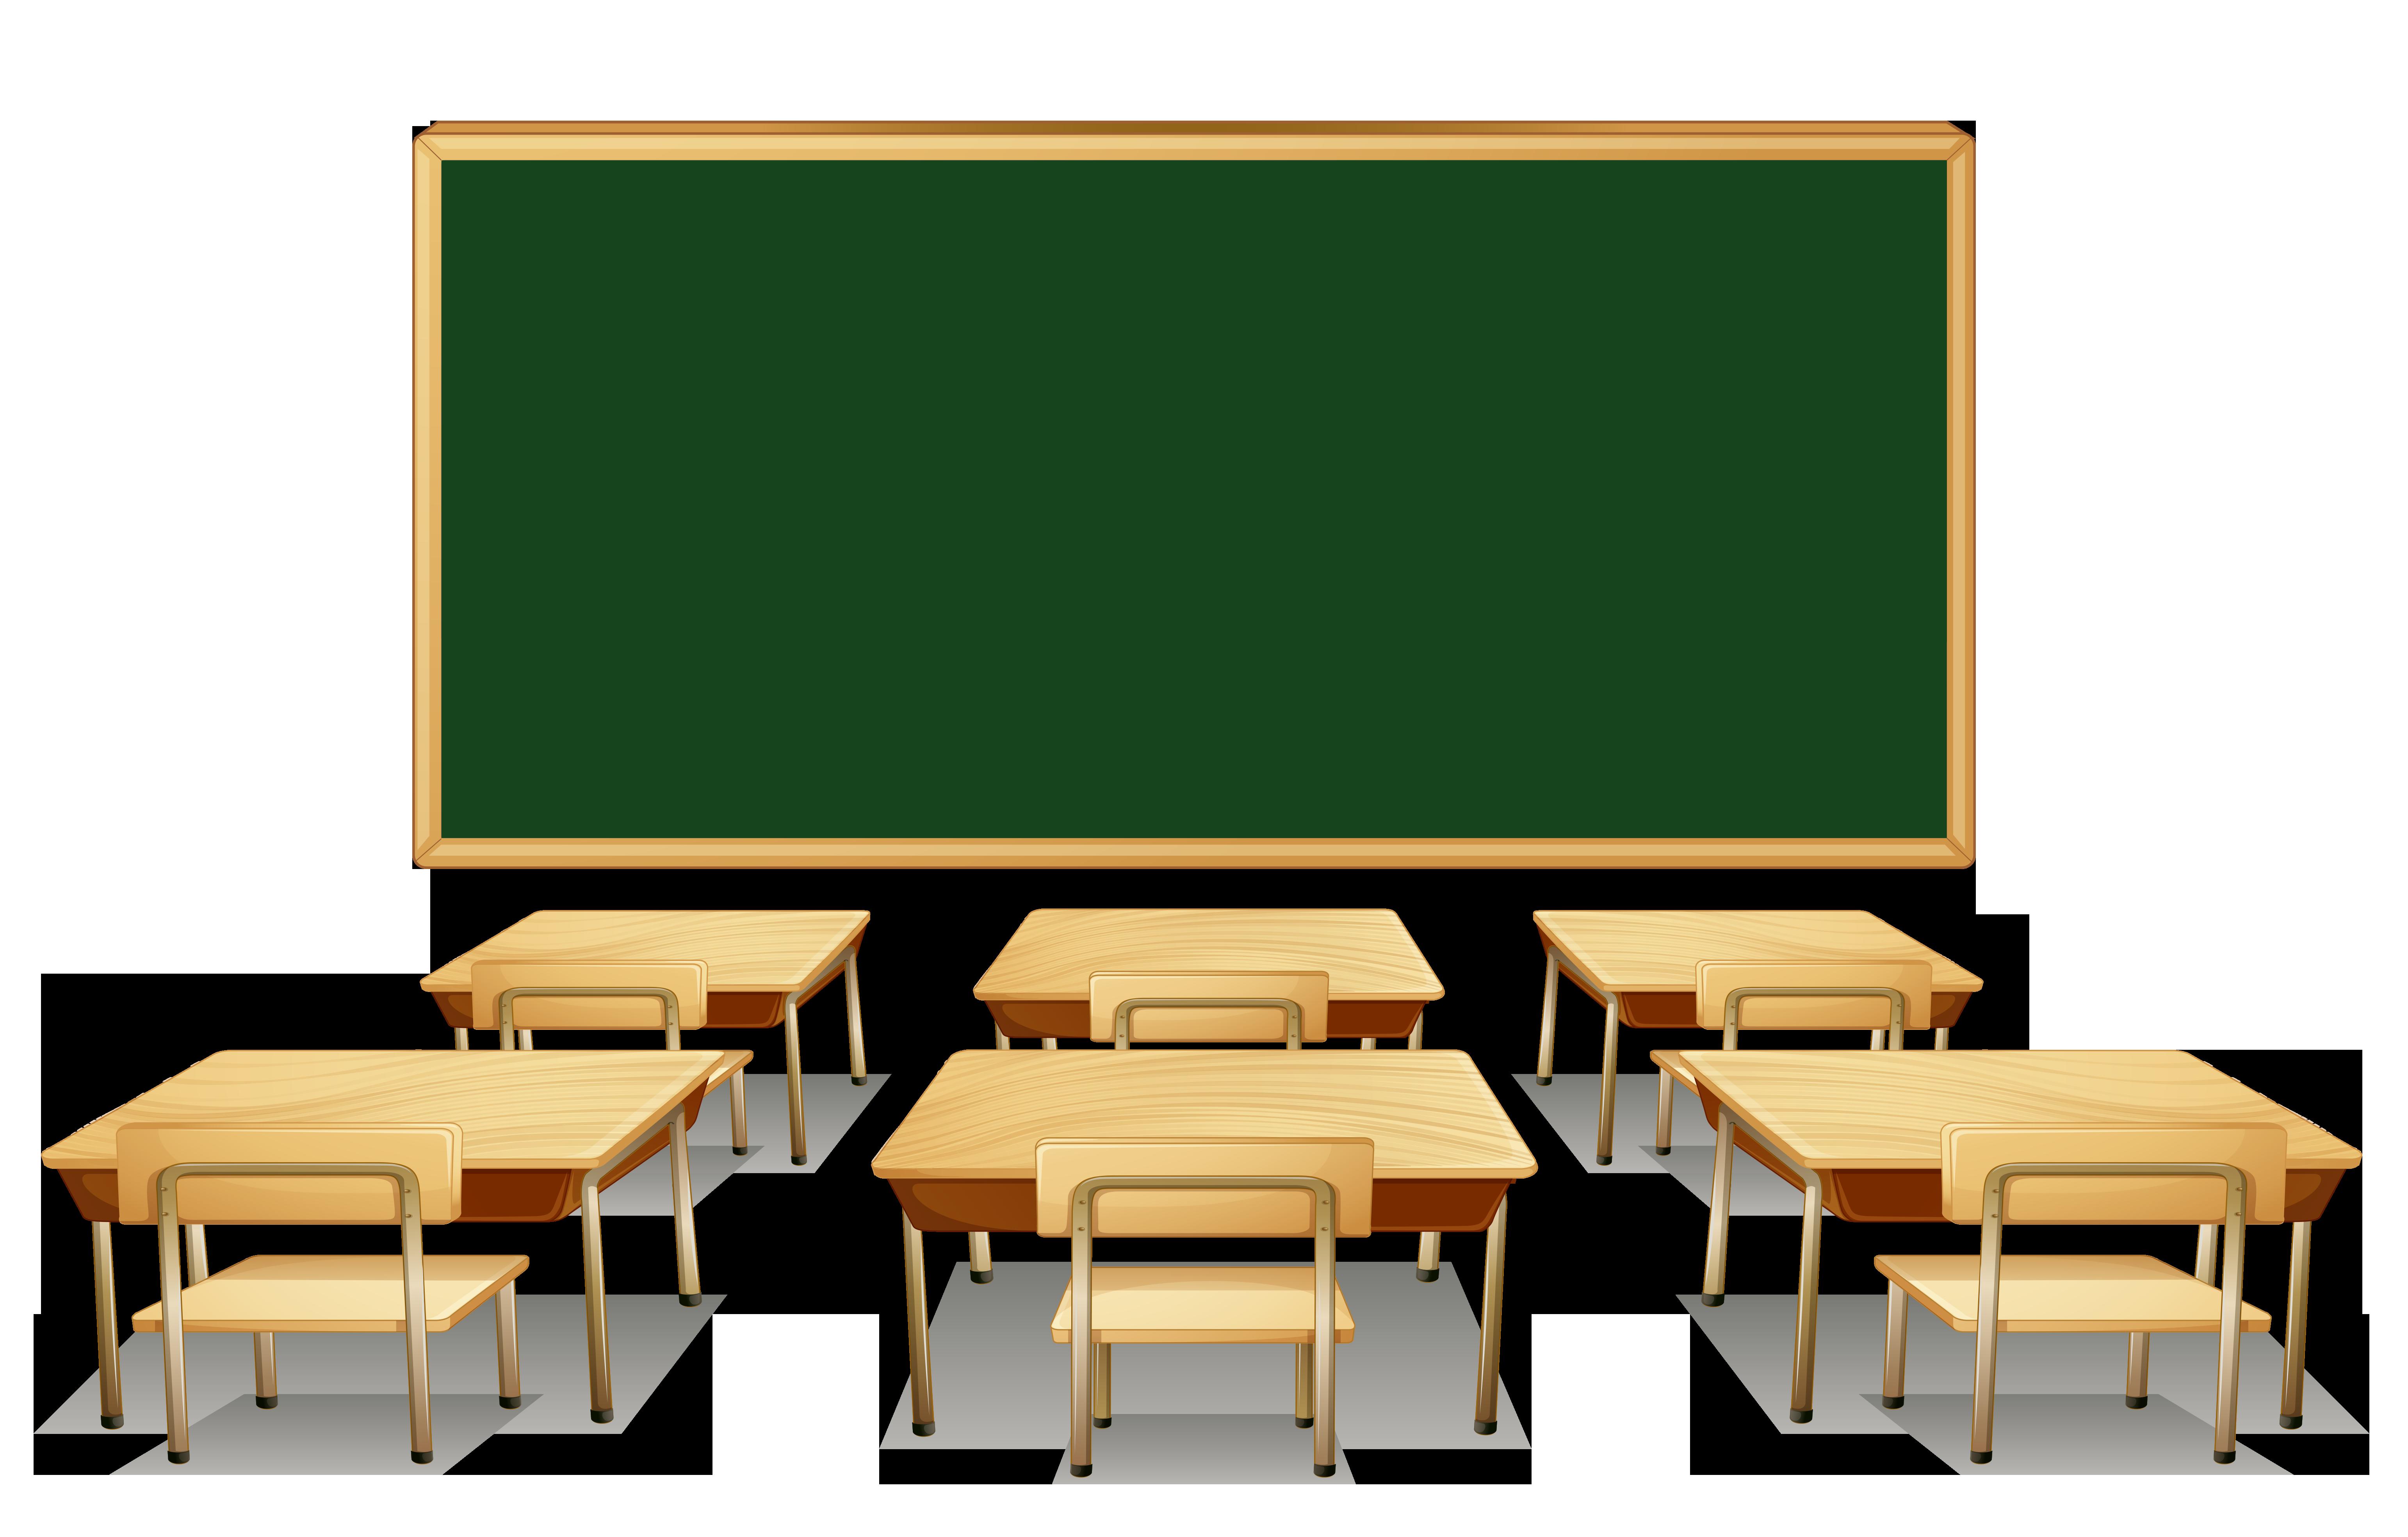 Pin by Anirban Pal on class room | School classroom ...